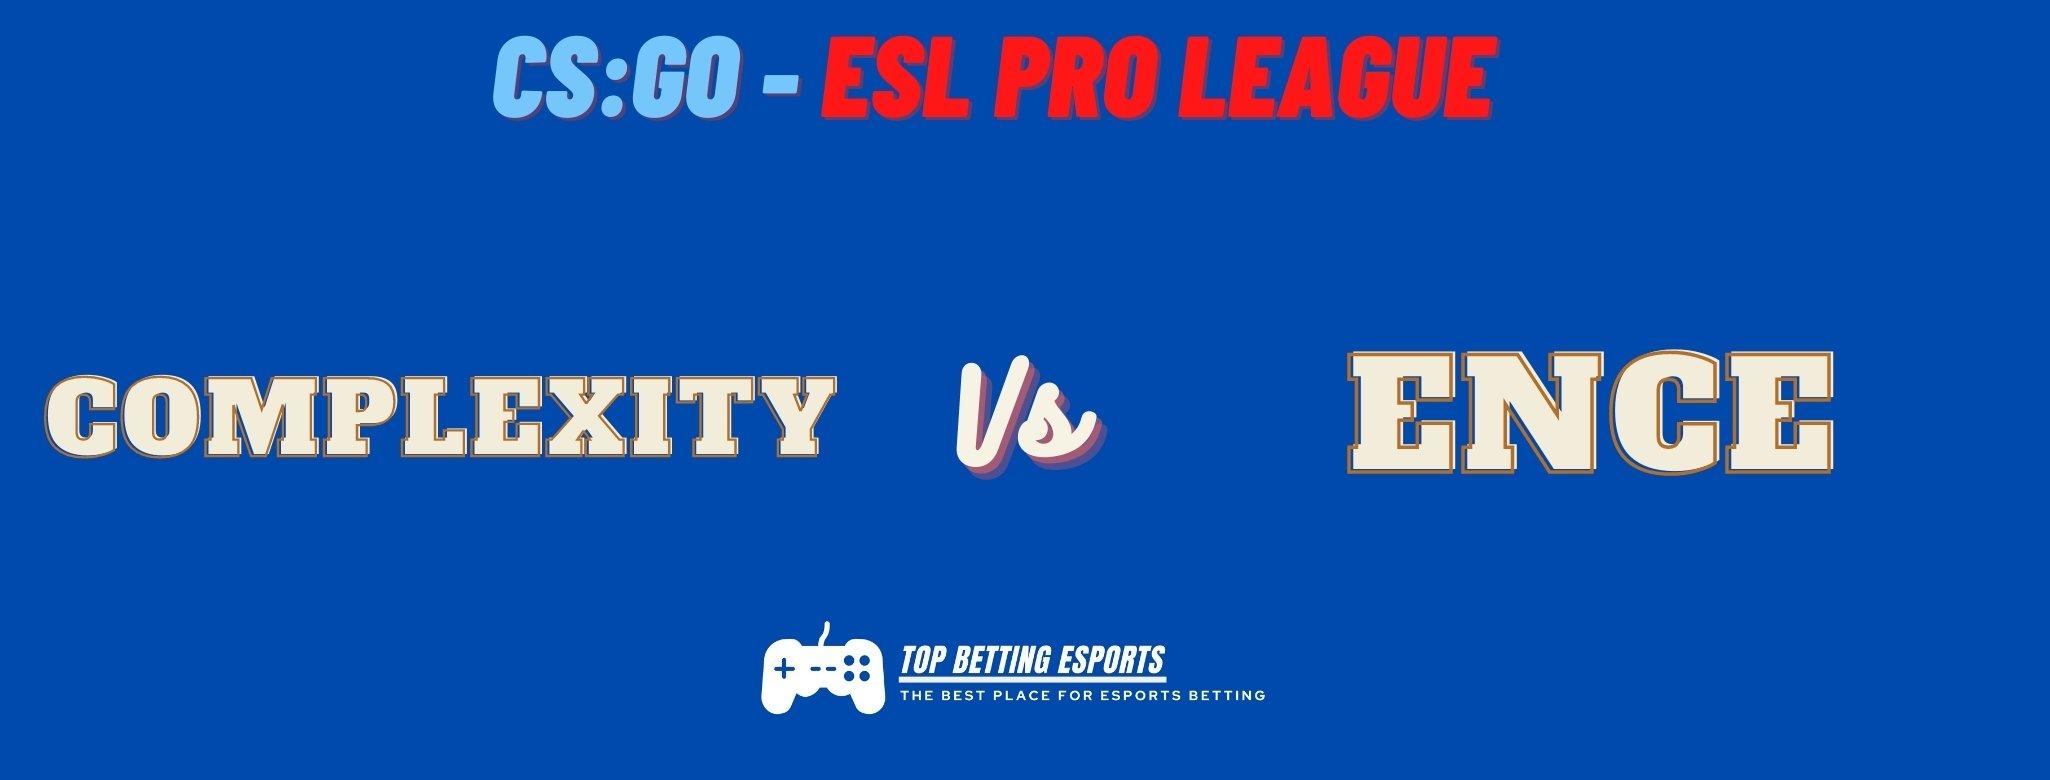 Esports betting tips: ESL Pro League EU prediction COMPLEXITY vs ENCE